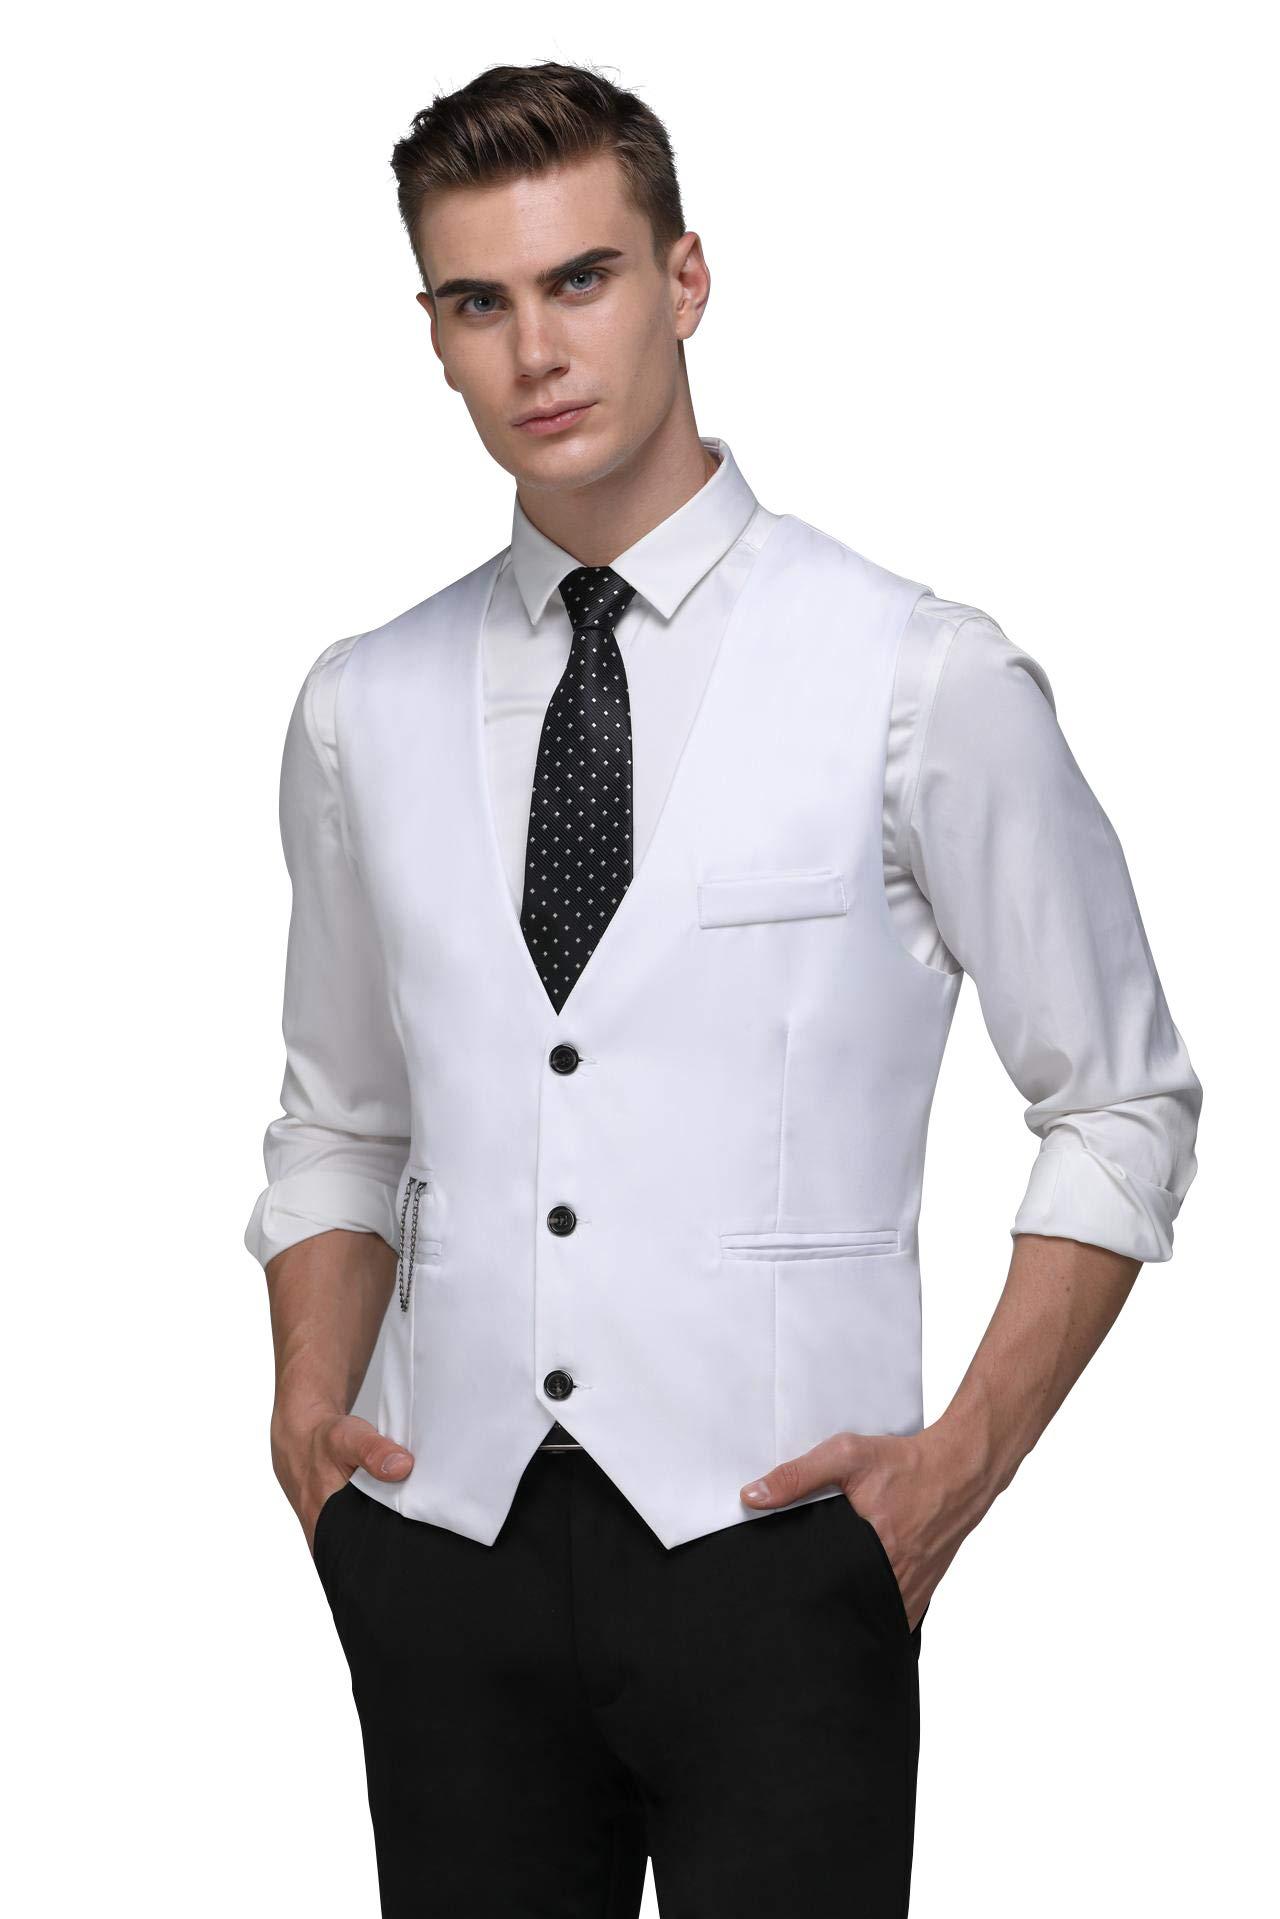 PXS Vest V-Neck Sleeveless Slim Fit Jacket Men Business Waistcoat (White, M) by PXS